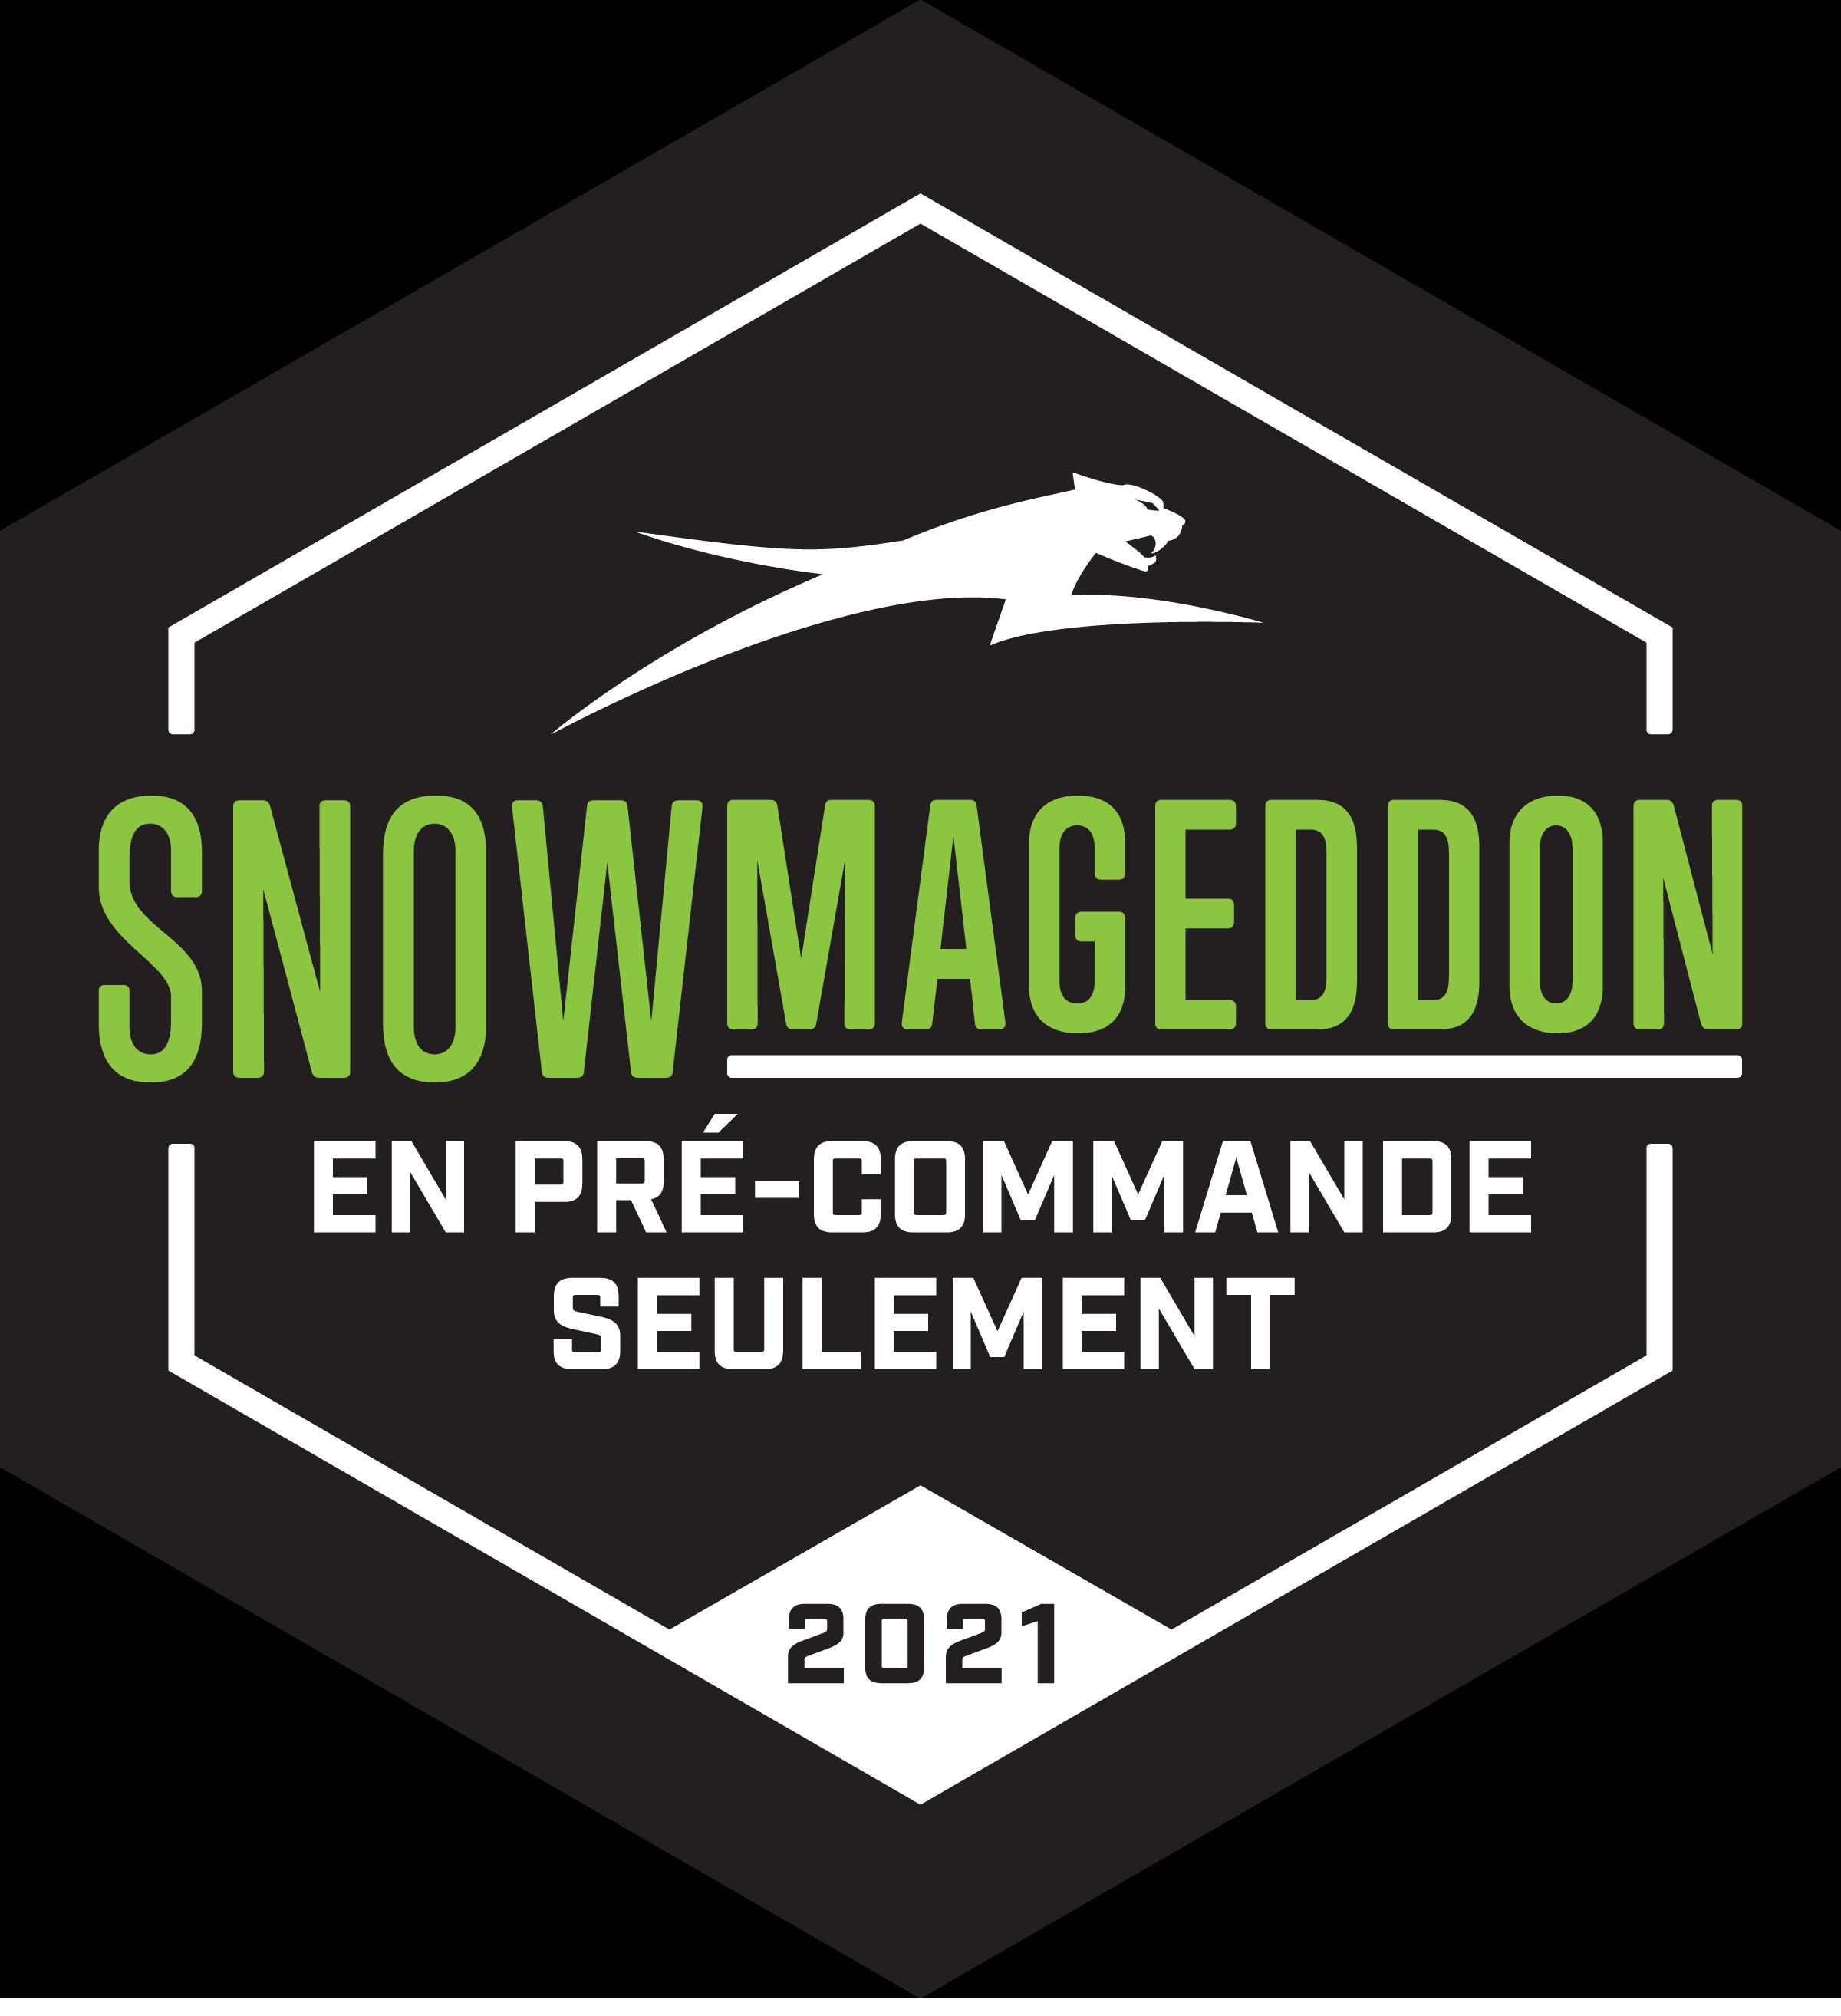 Snowmageddon 2021